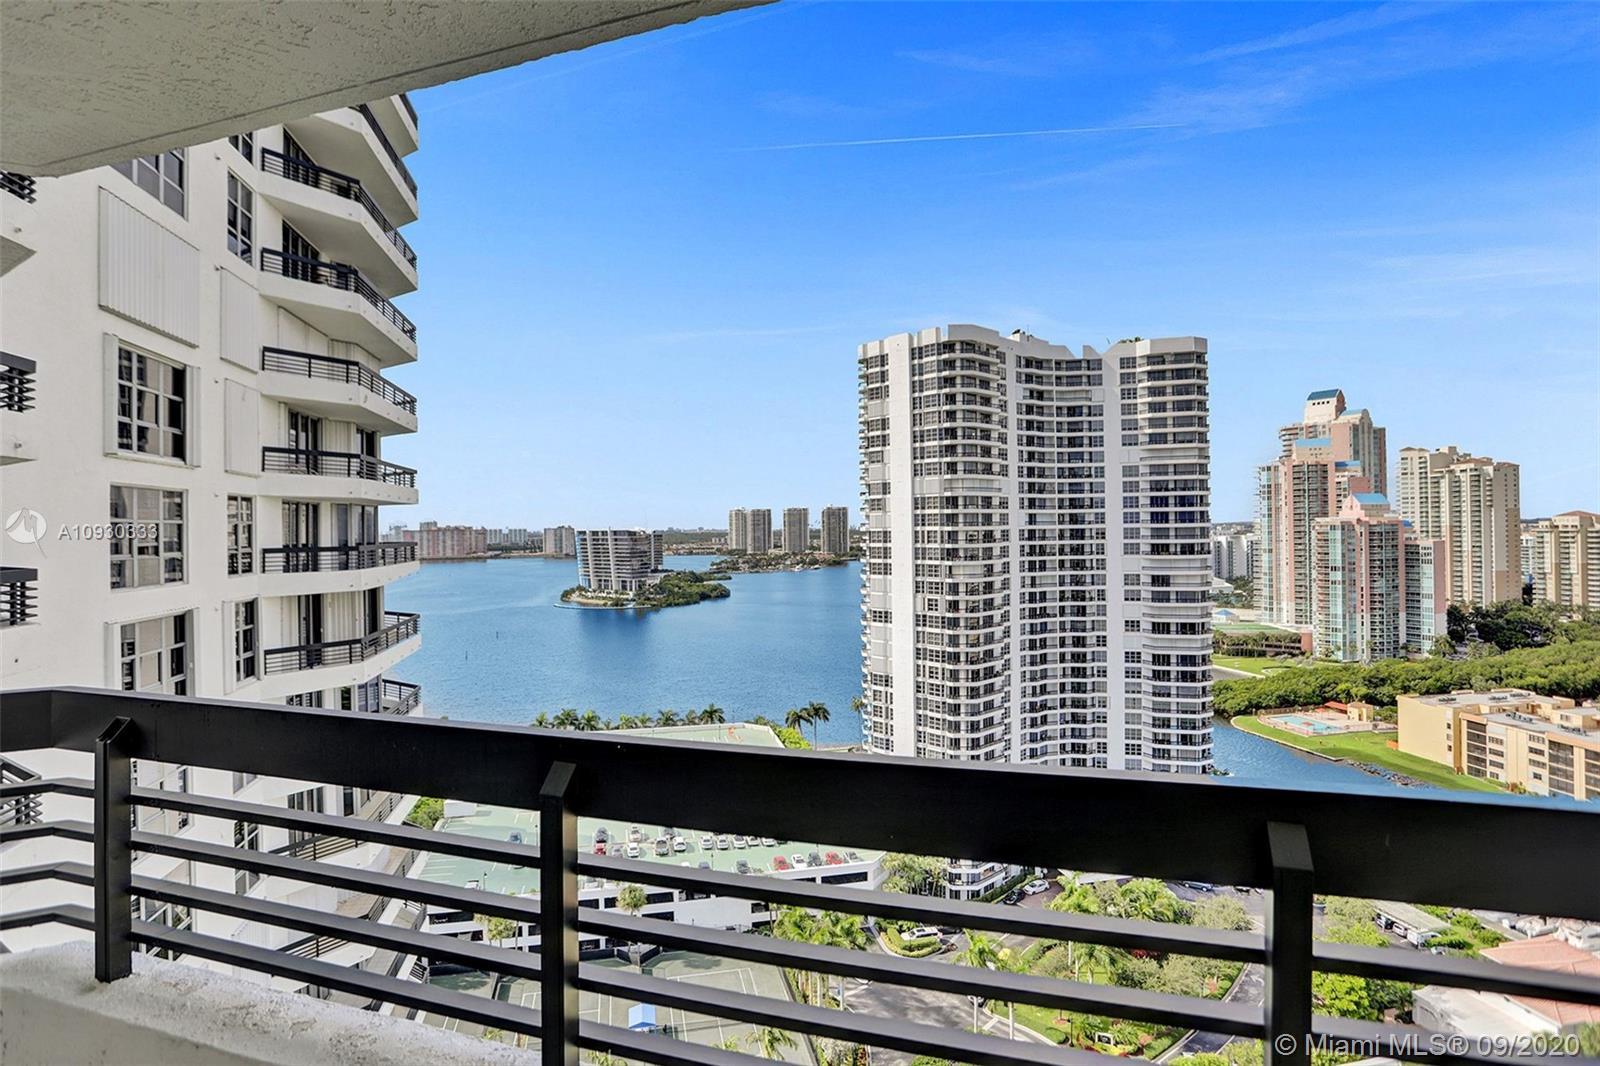 Mystic Pointe Tower 400 #2403 - 3500 Mystic Pointe Dr #2403, Aventura, FL 33180